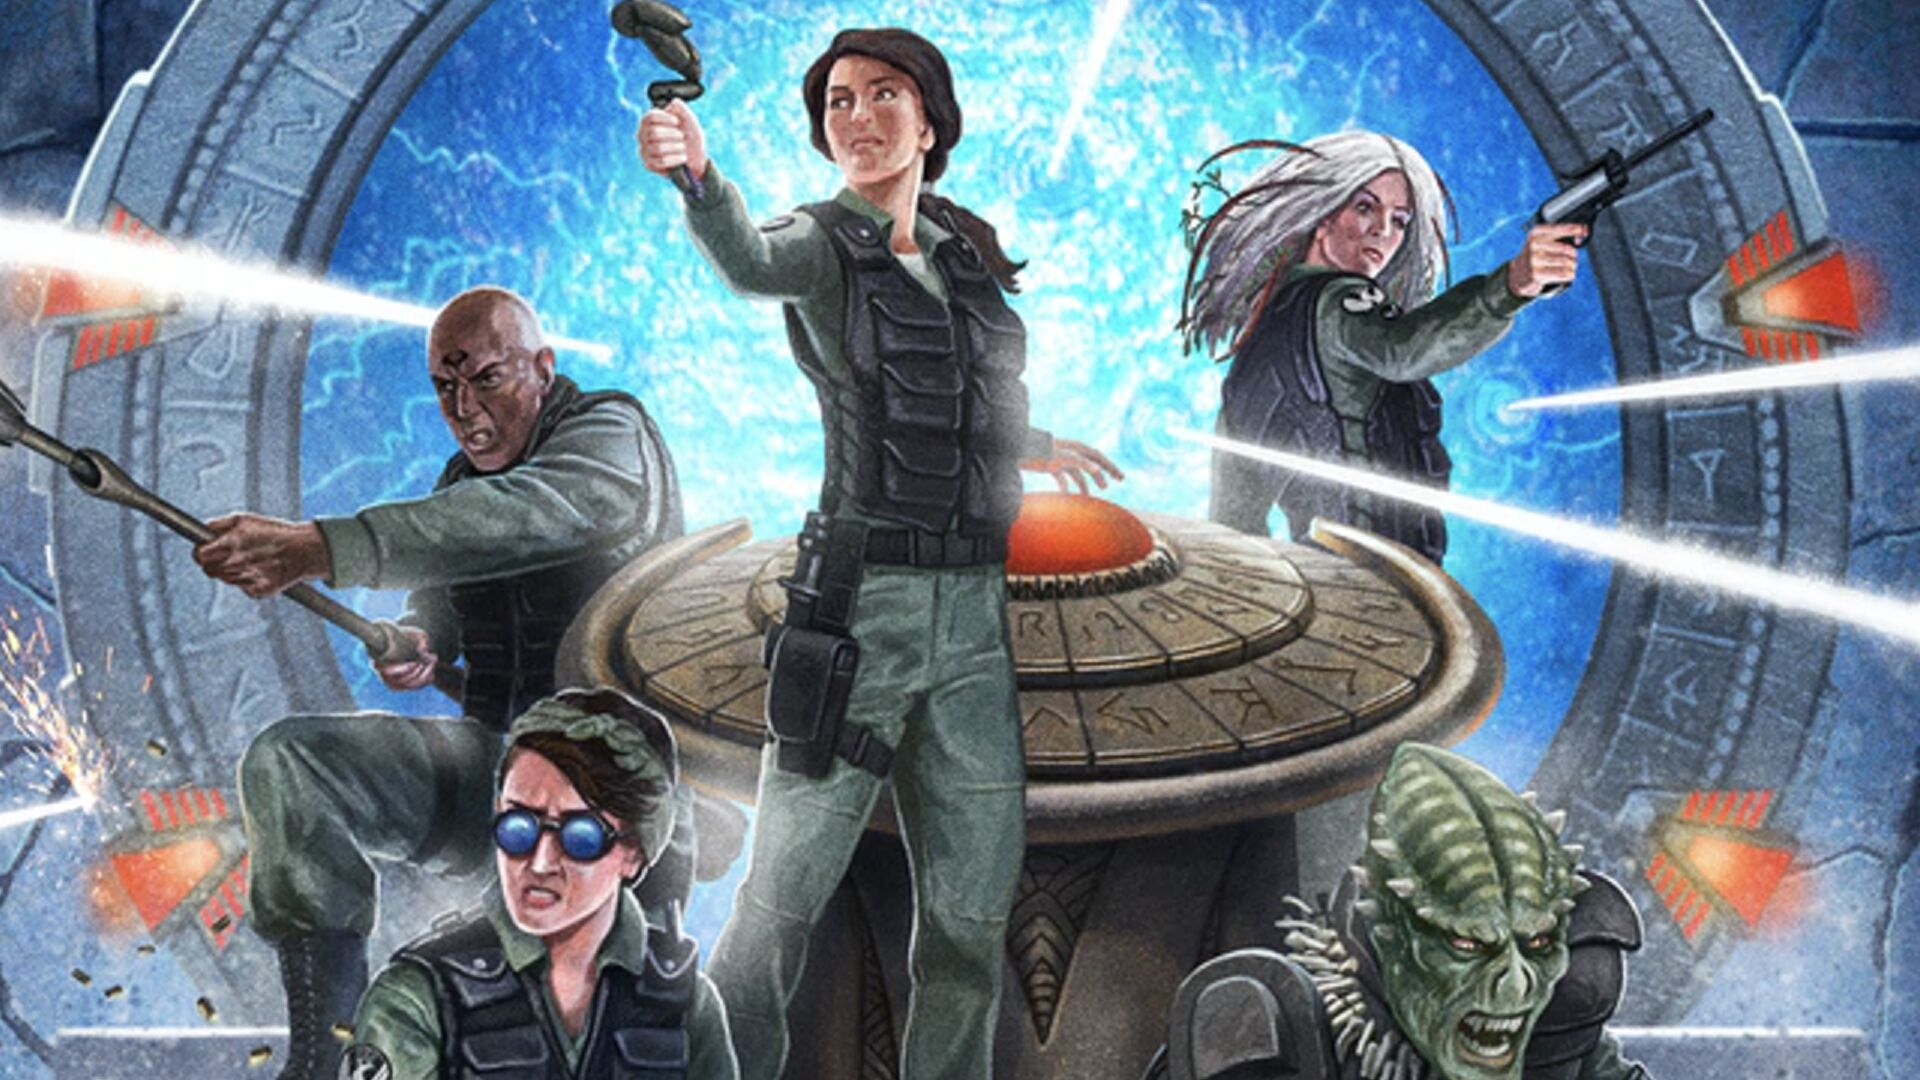 Stargate Atlantis HD Wallpaper | Background Image